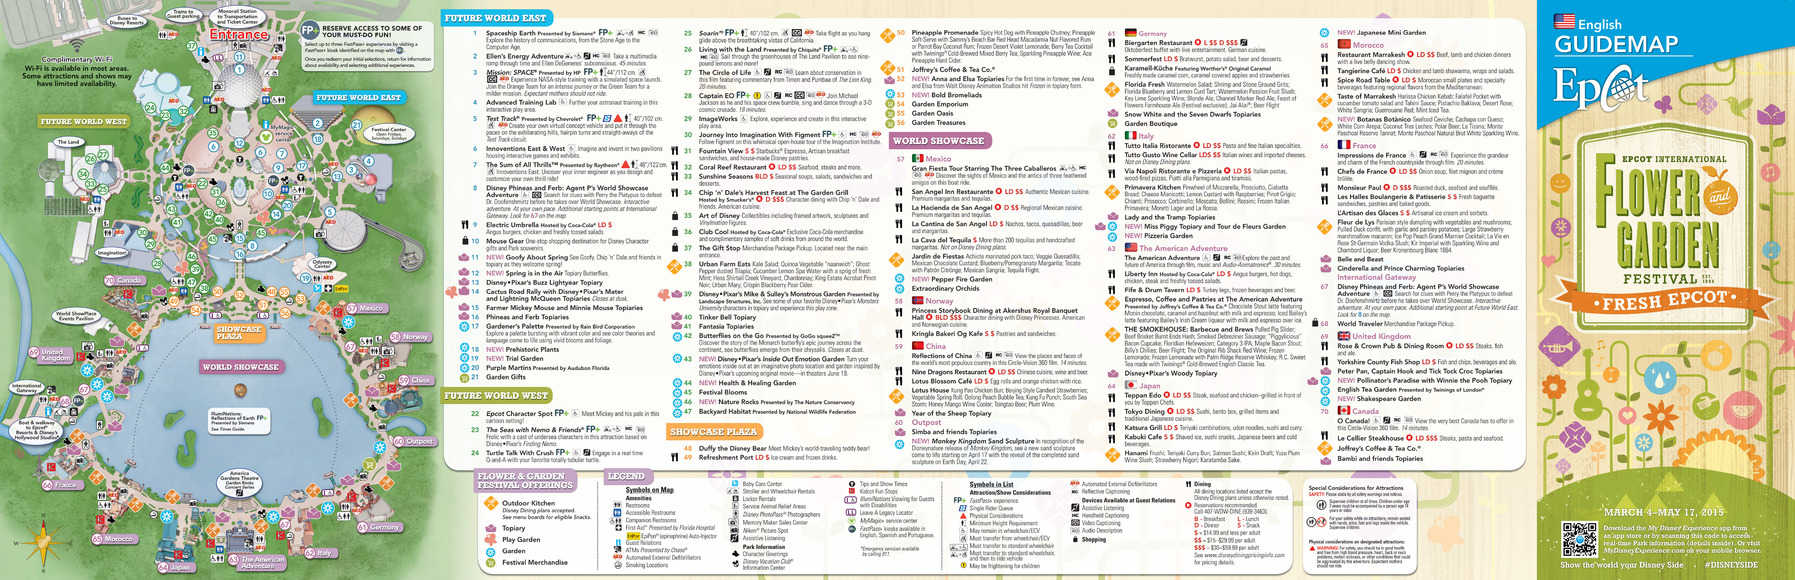 epcot flower and garden festival map | kennythepirate